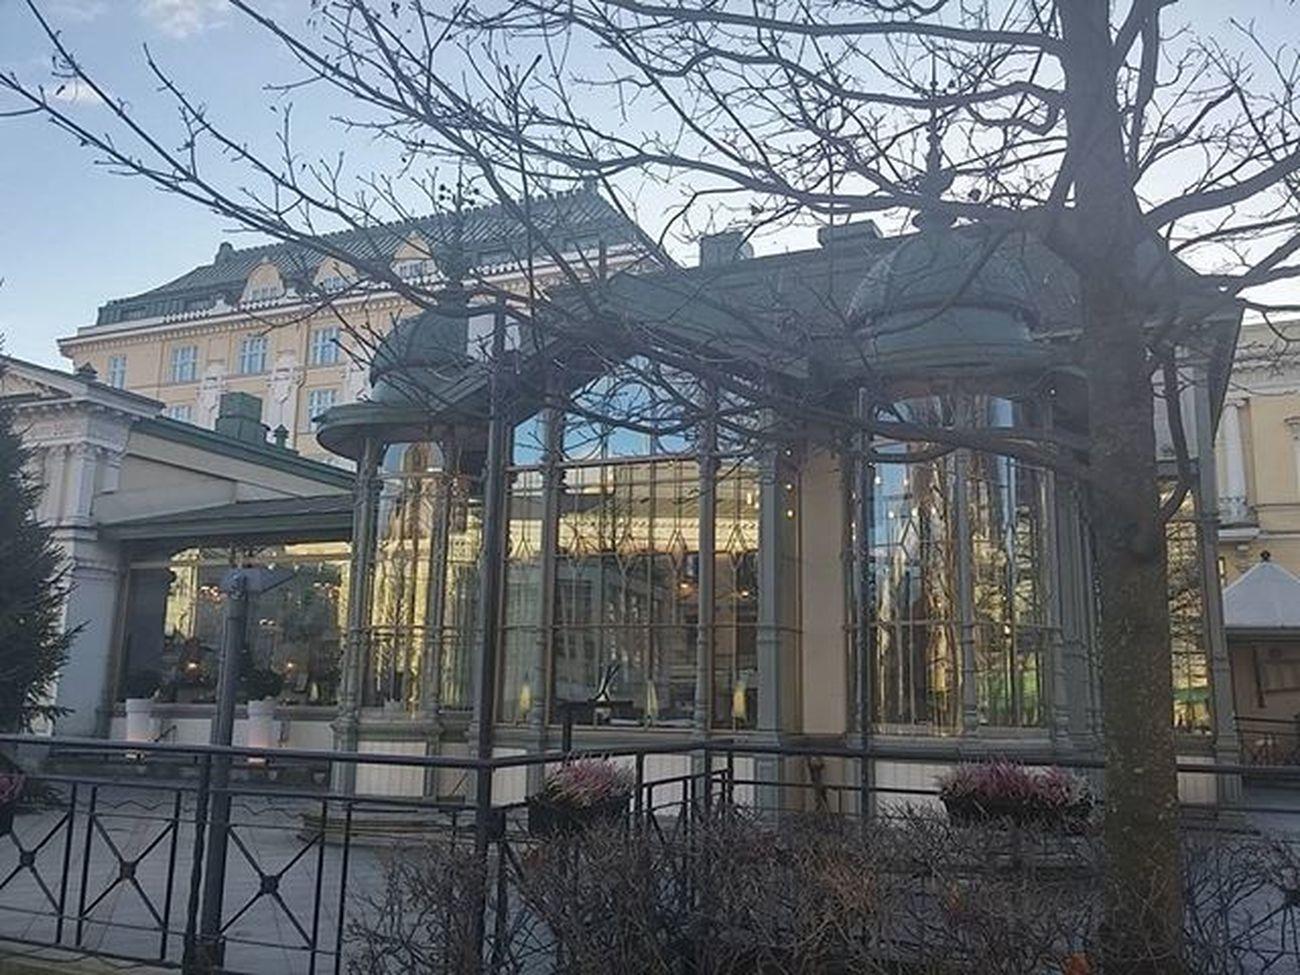 Ravintolakappeli Kappelirestaurant Esplanadi Helsinki Igershelsinki Finland Suomi Igersfinland Finlandlovers Ourfinland Thisisfinland